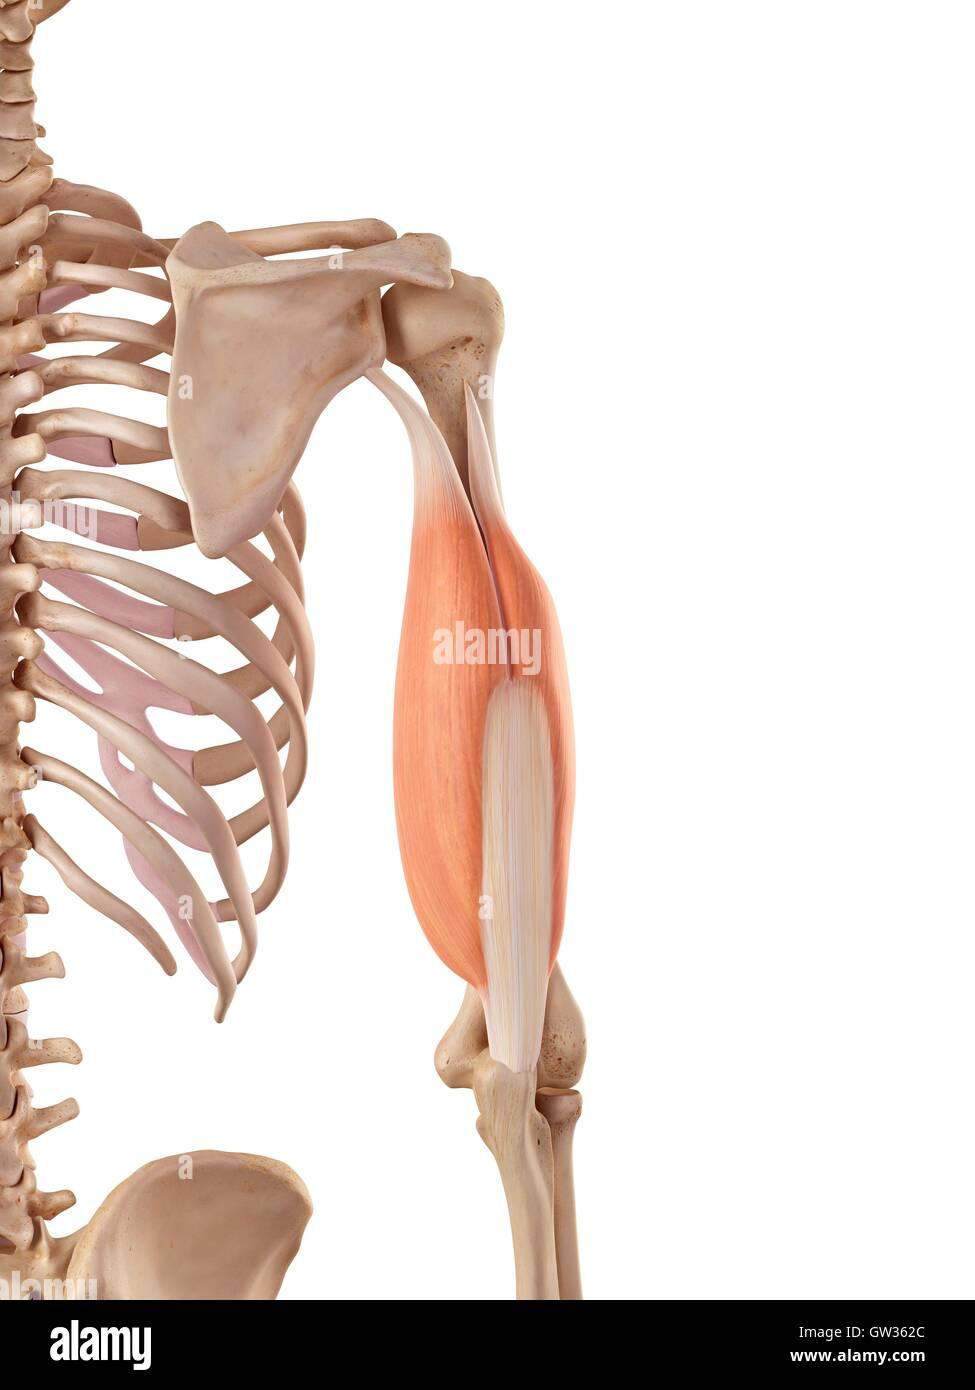 Human Triceps Imágenes De Stock & Human Triceps Fotos De Stock - Alamy